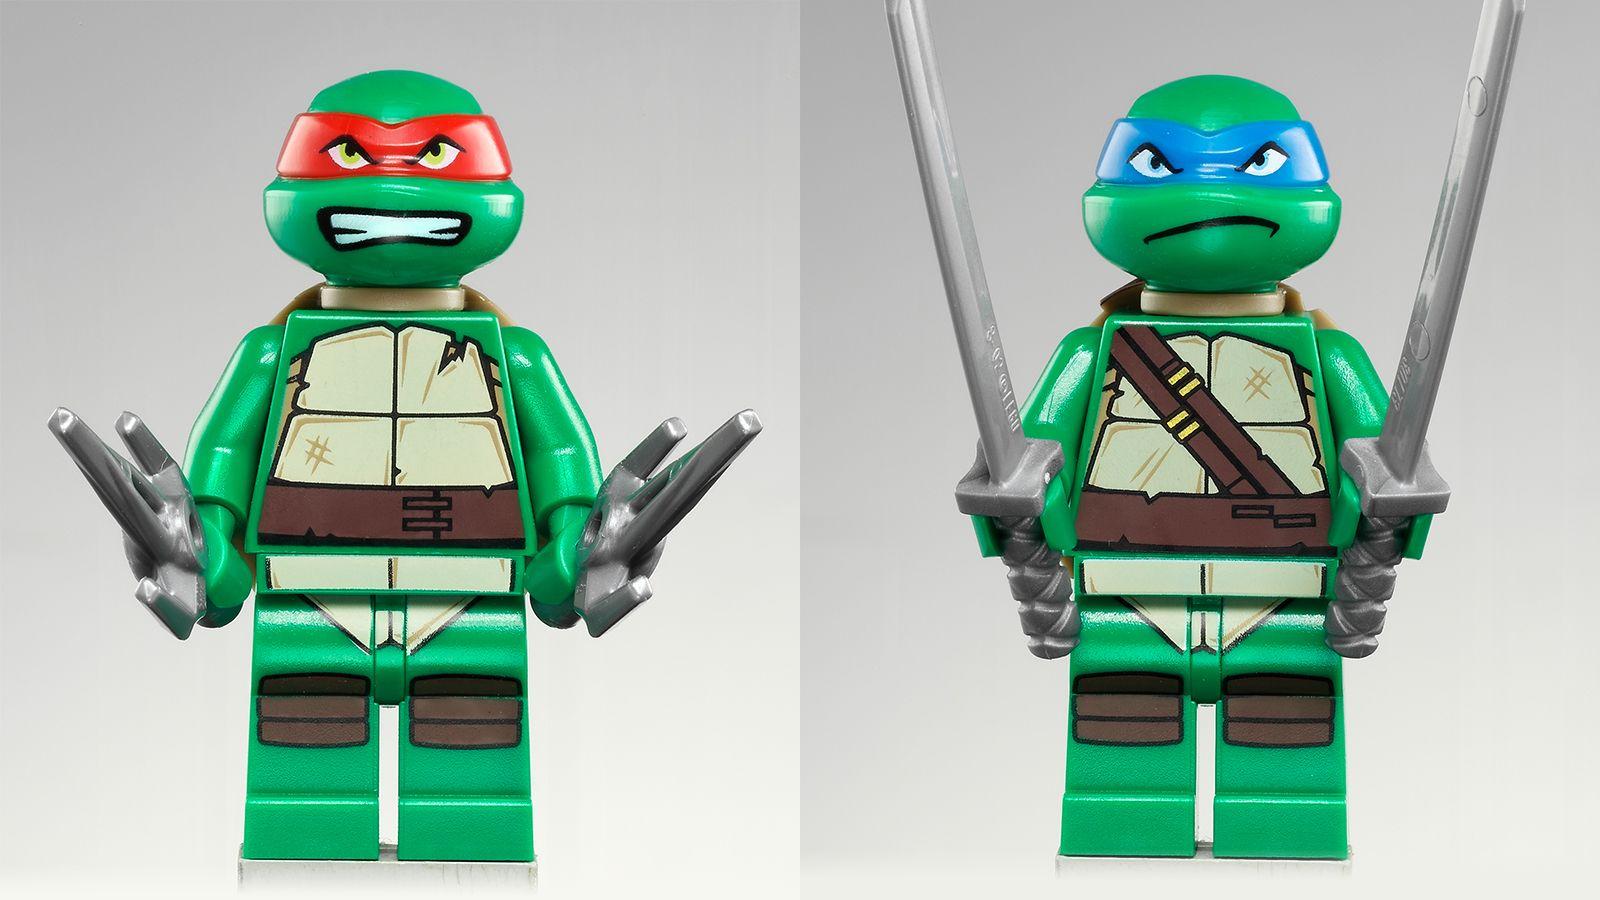 Lego Teenage Mutant Ninja Turtles Official Collection, People